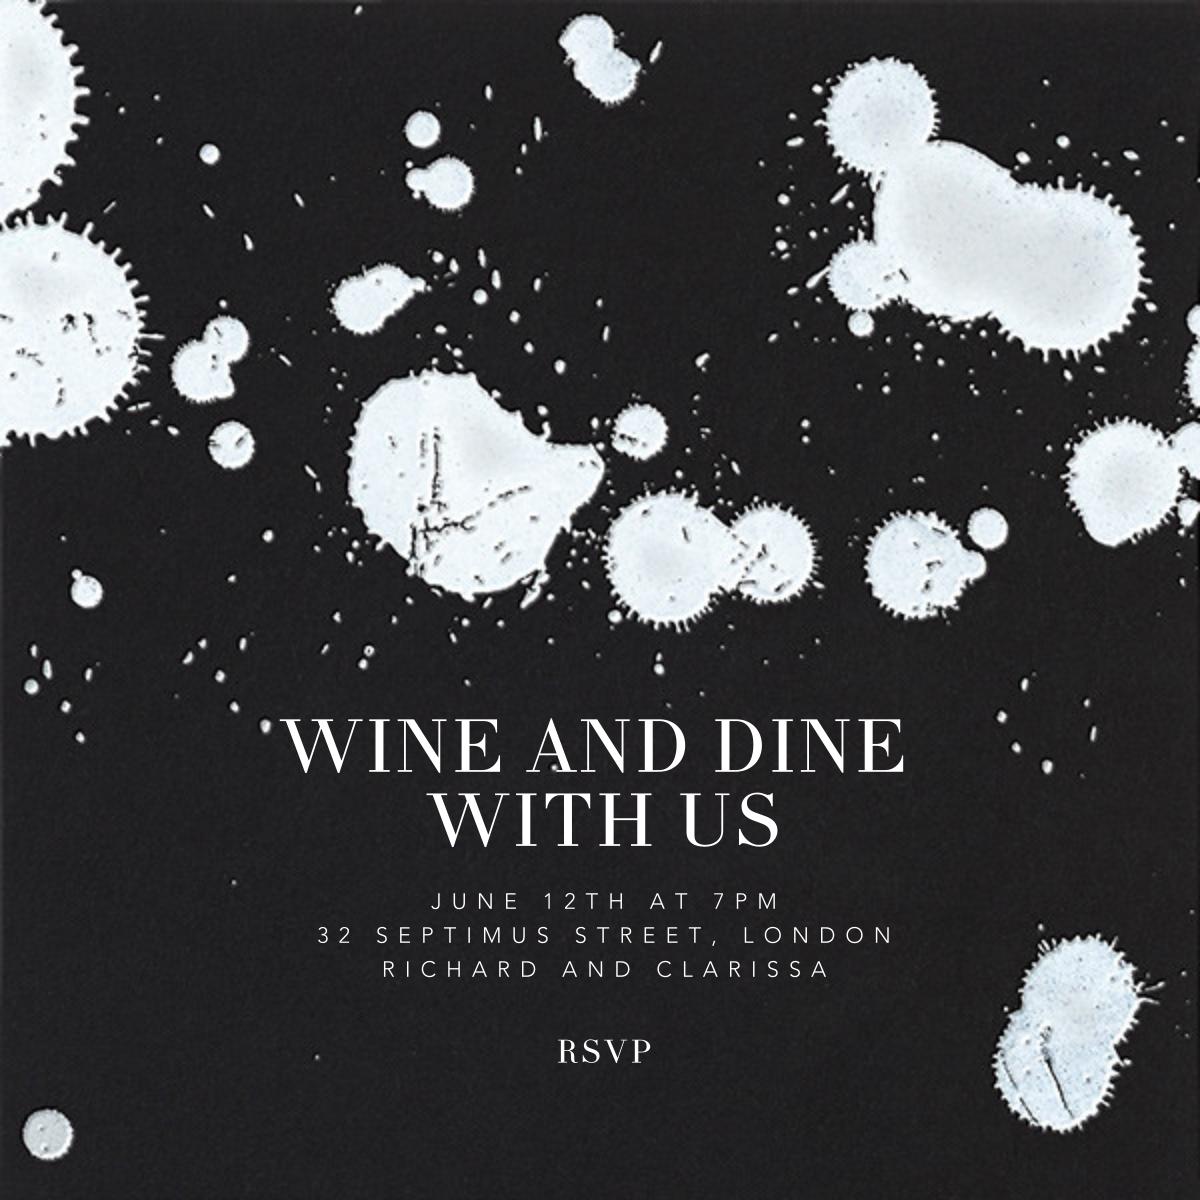 Schizzata - Black/White - Kelly Wearstler - Cocktail party